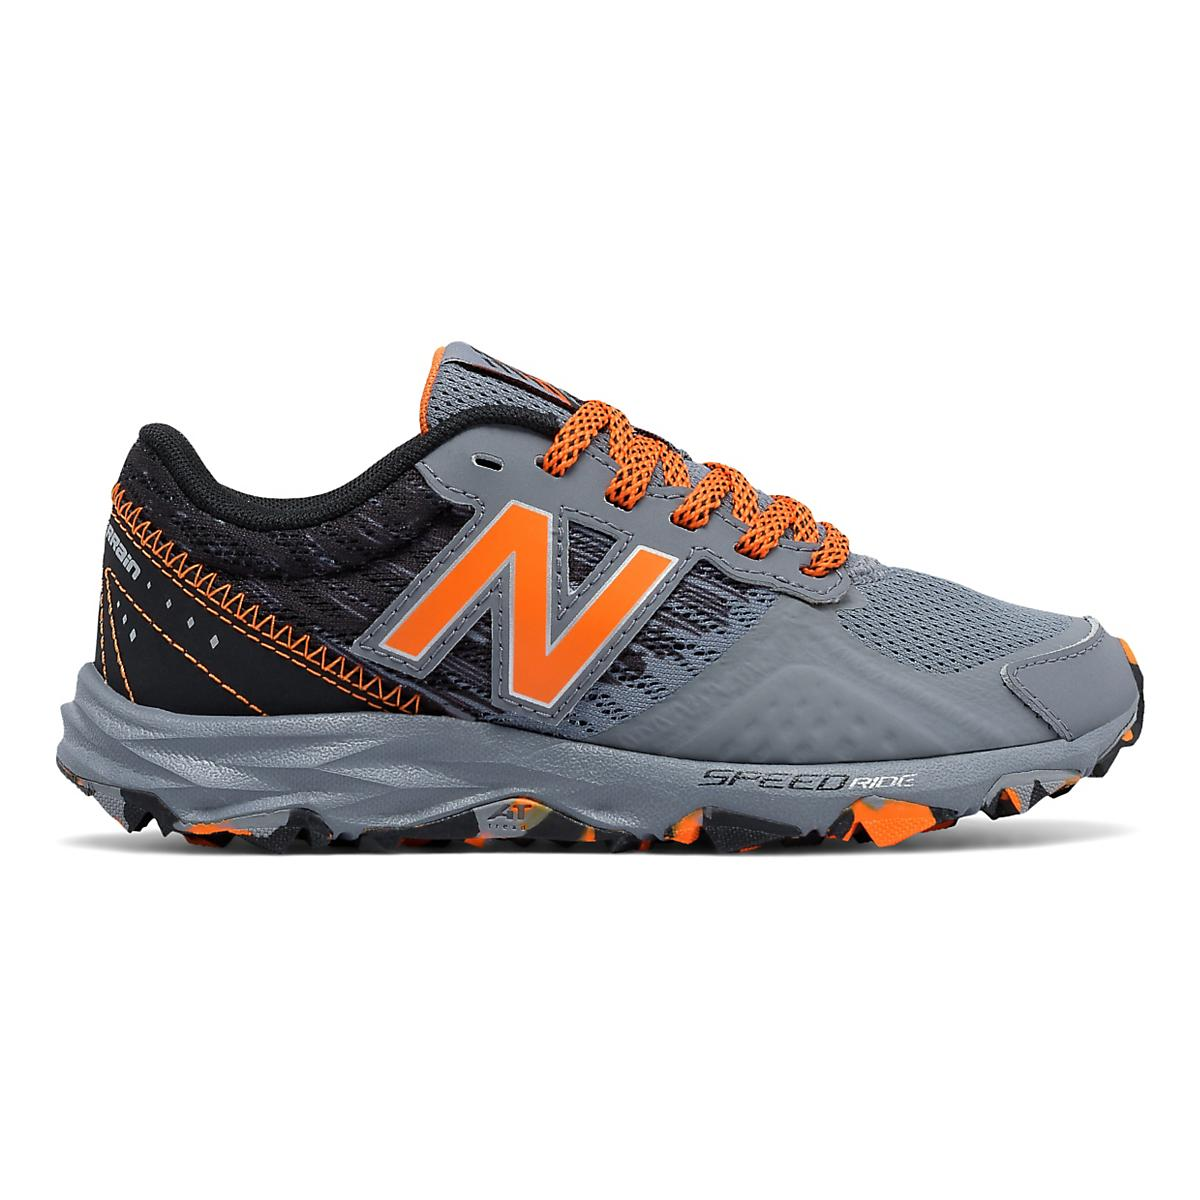 new balance 690v2 trail